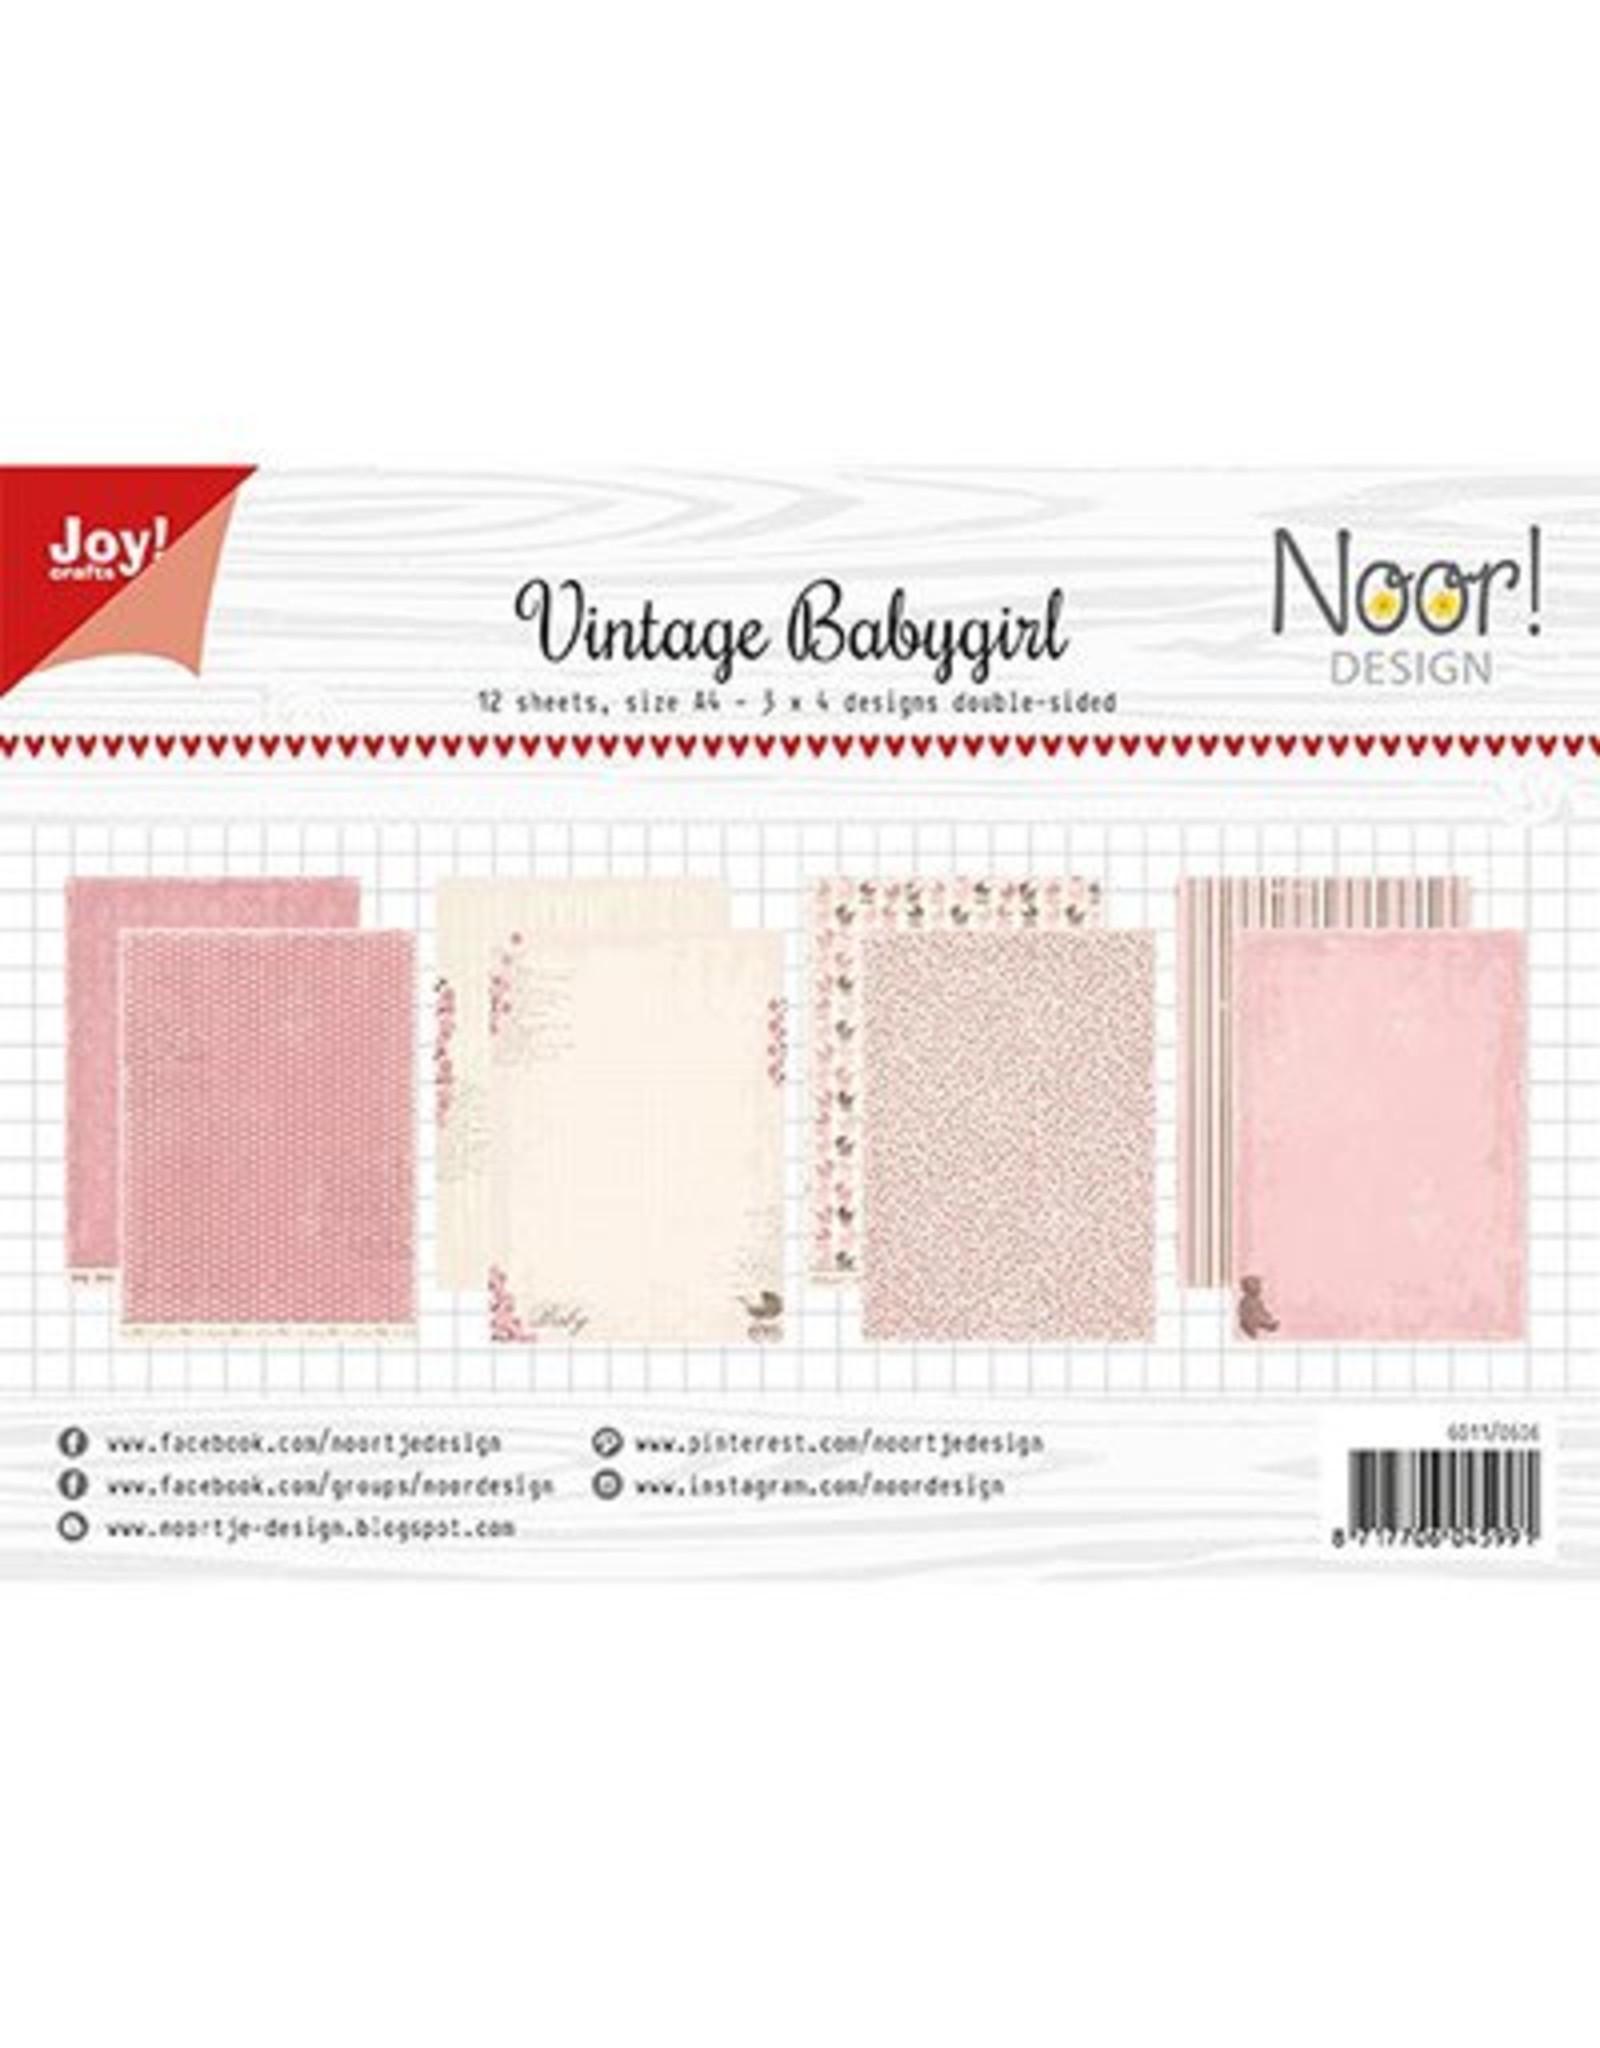 Joy Craft Joy Crafts Papierset - Design Vintage Babygirl 6011/0606